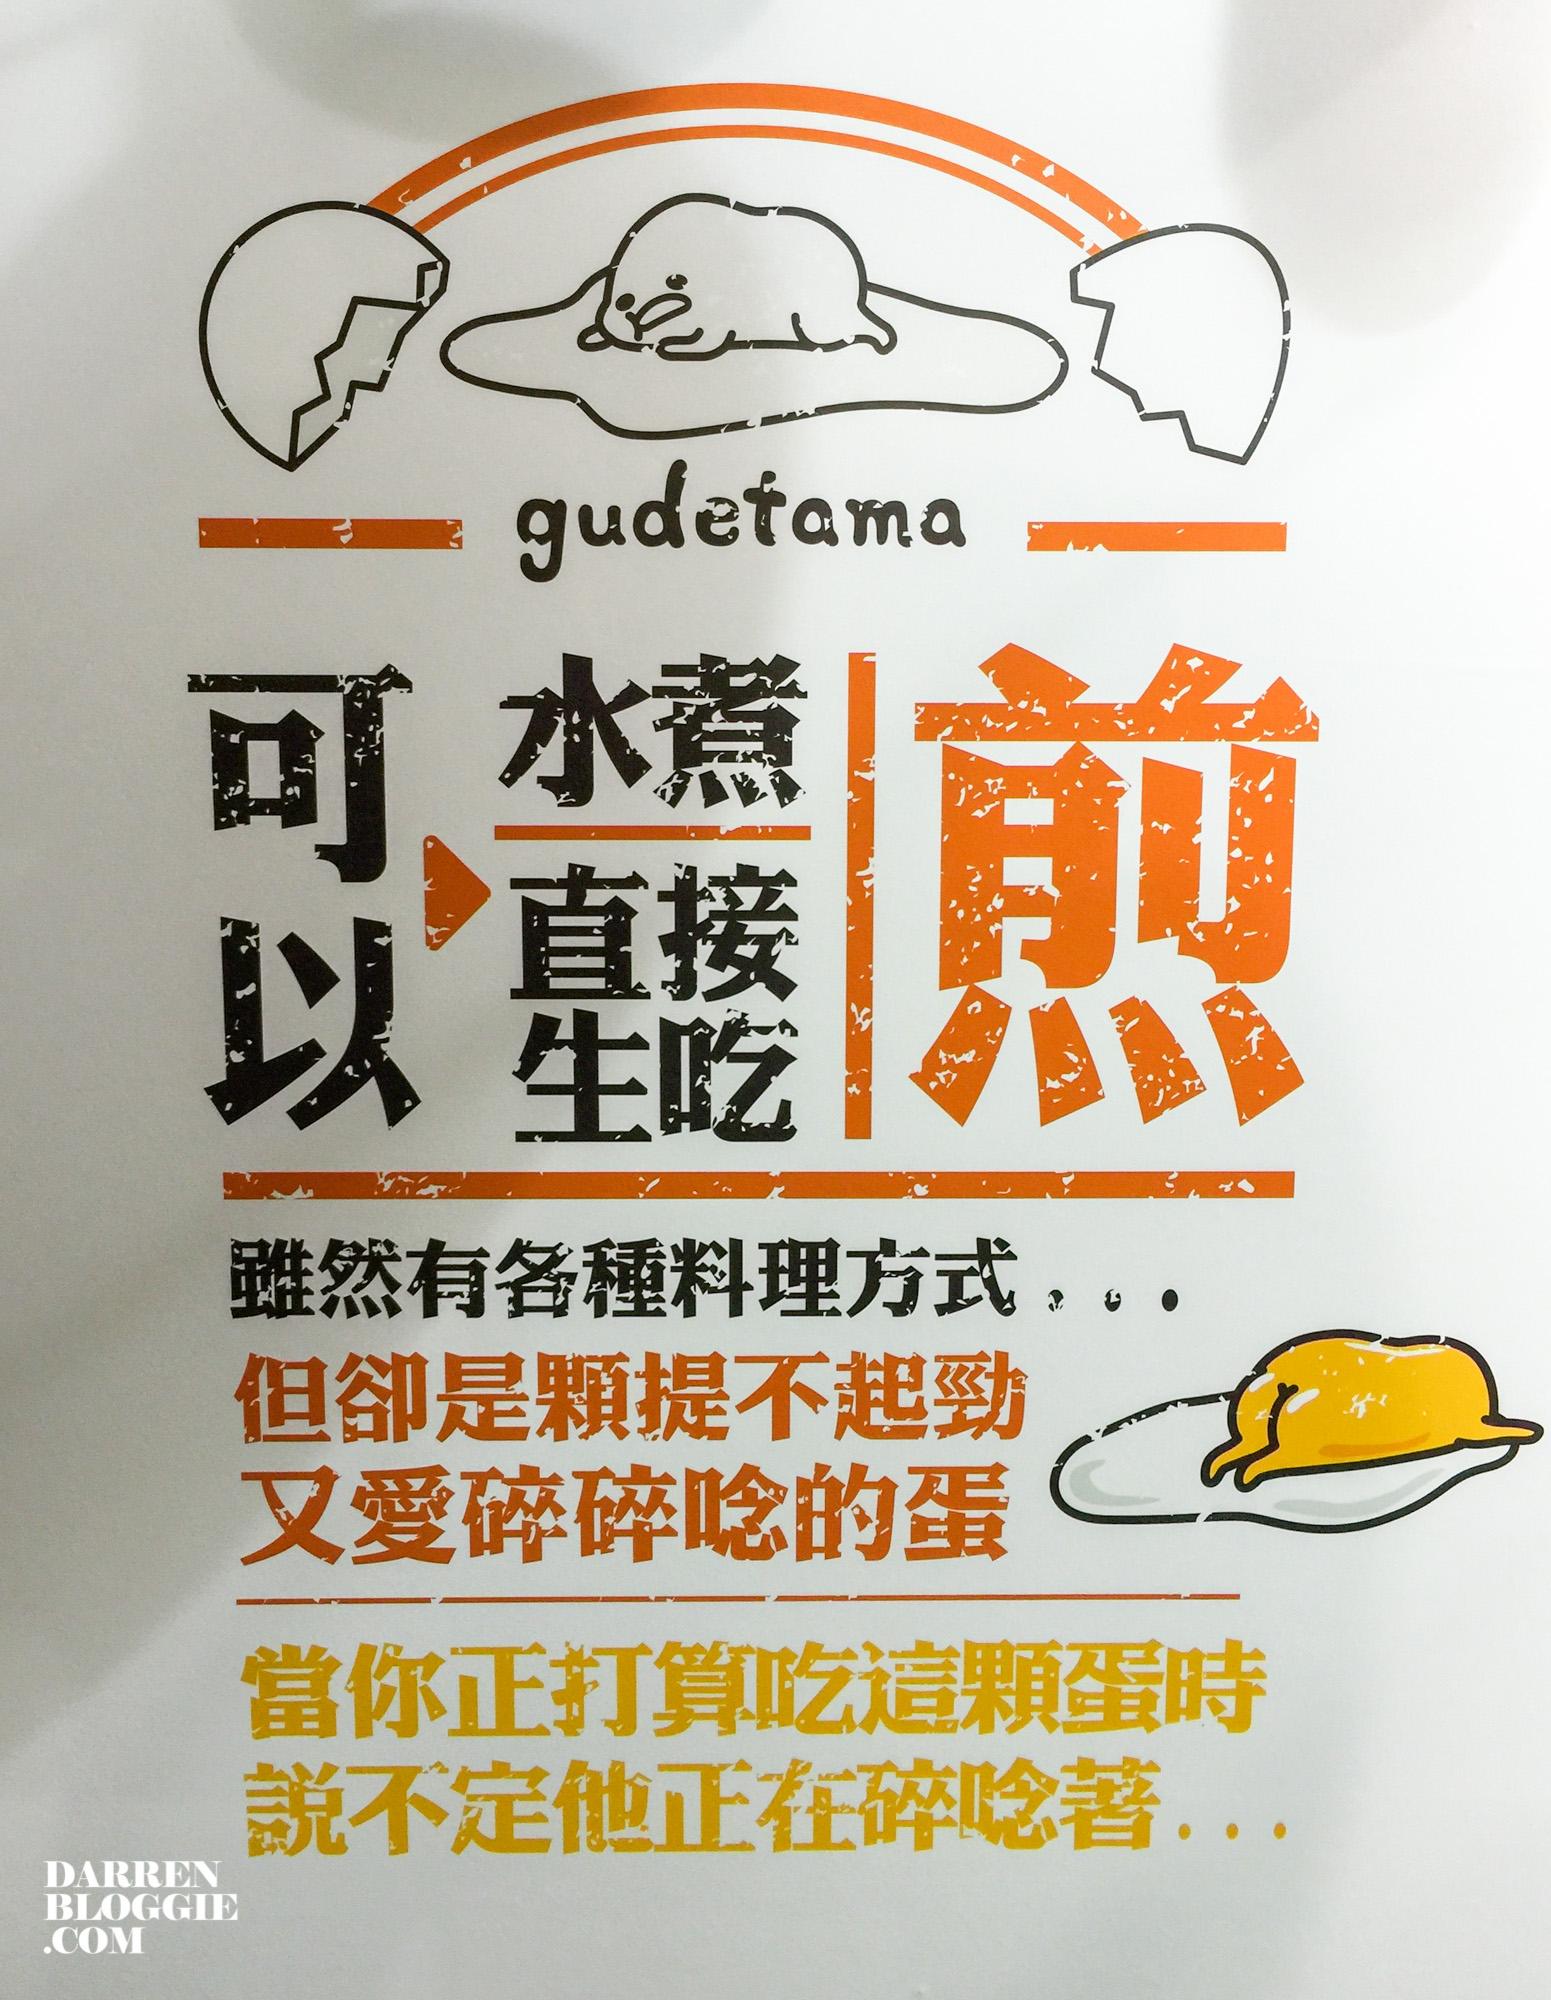 IMG_0284_gudetama_taipei_exhibition